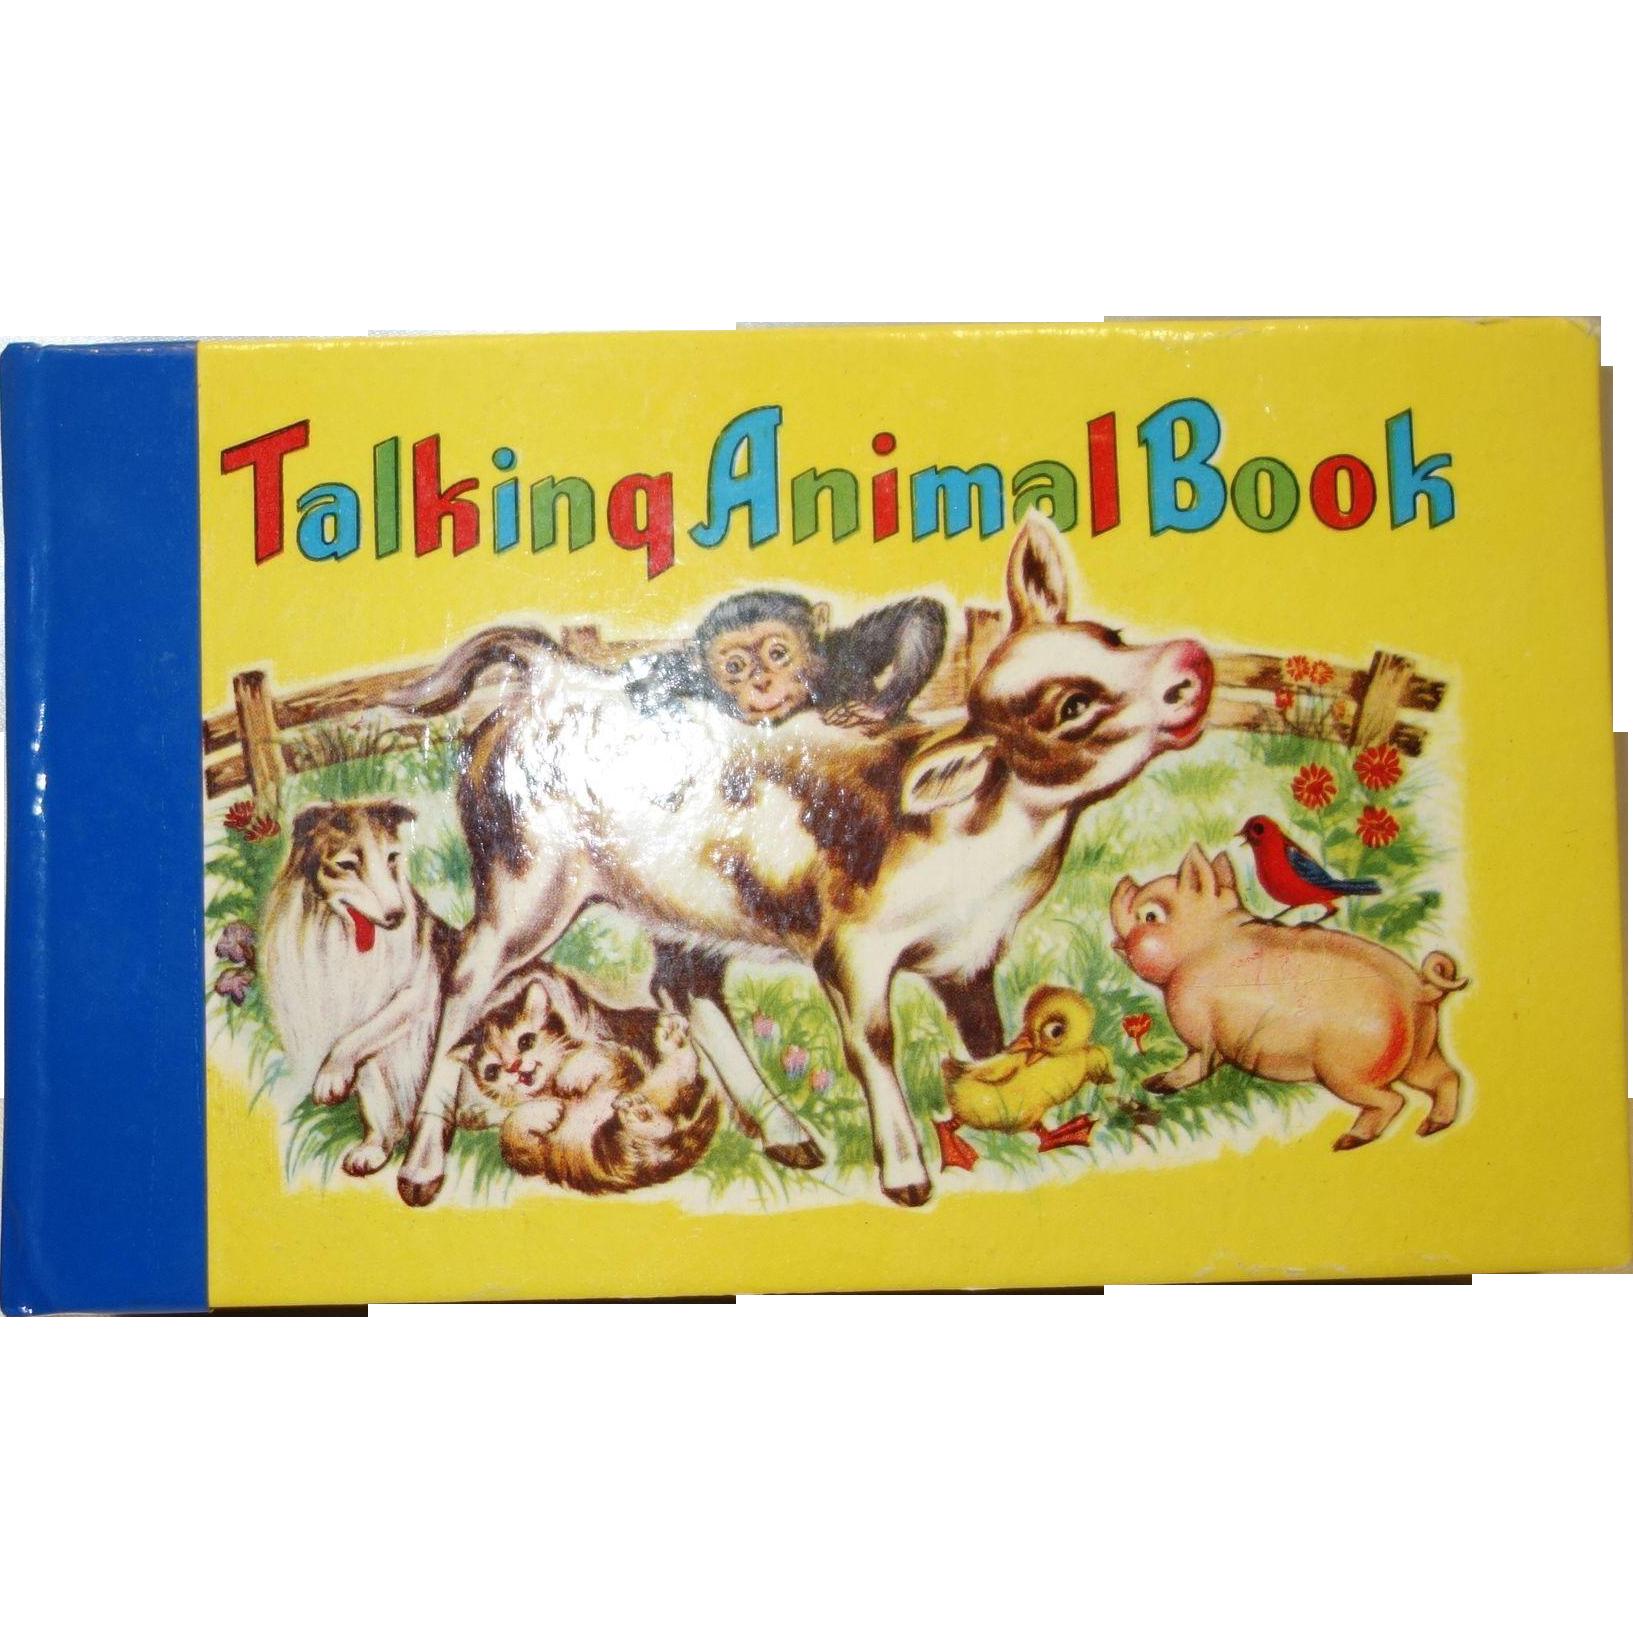 Vintage 1950's Talking Animal Squeaky Book